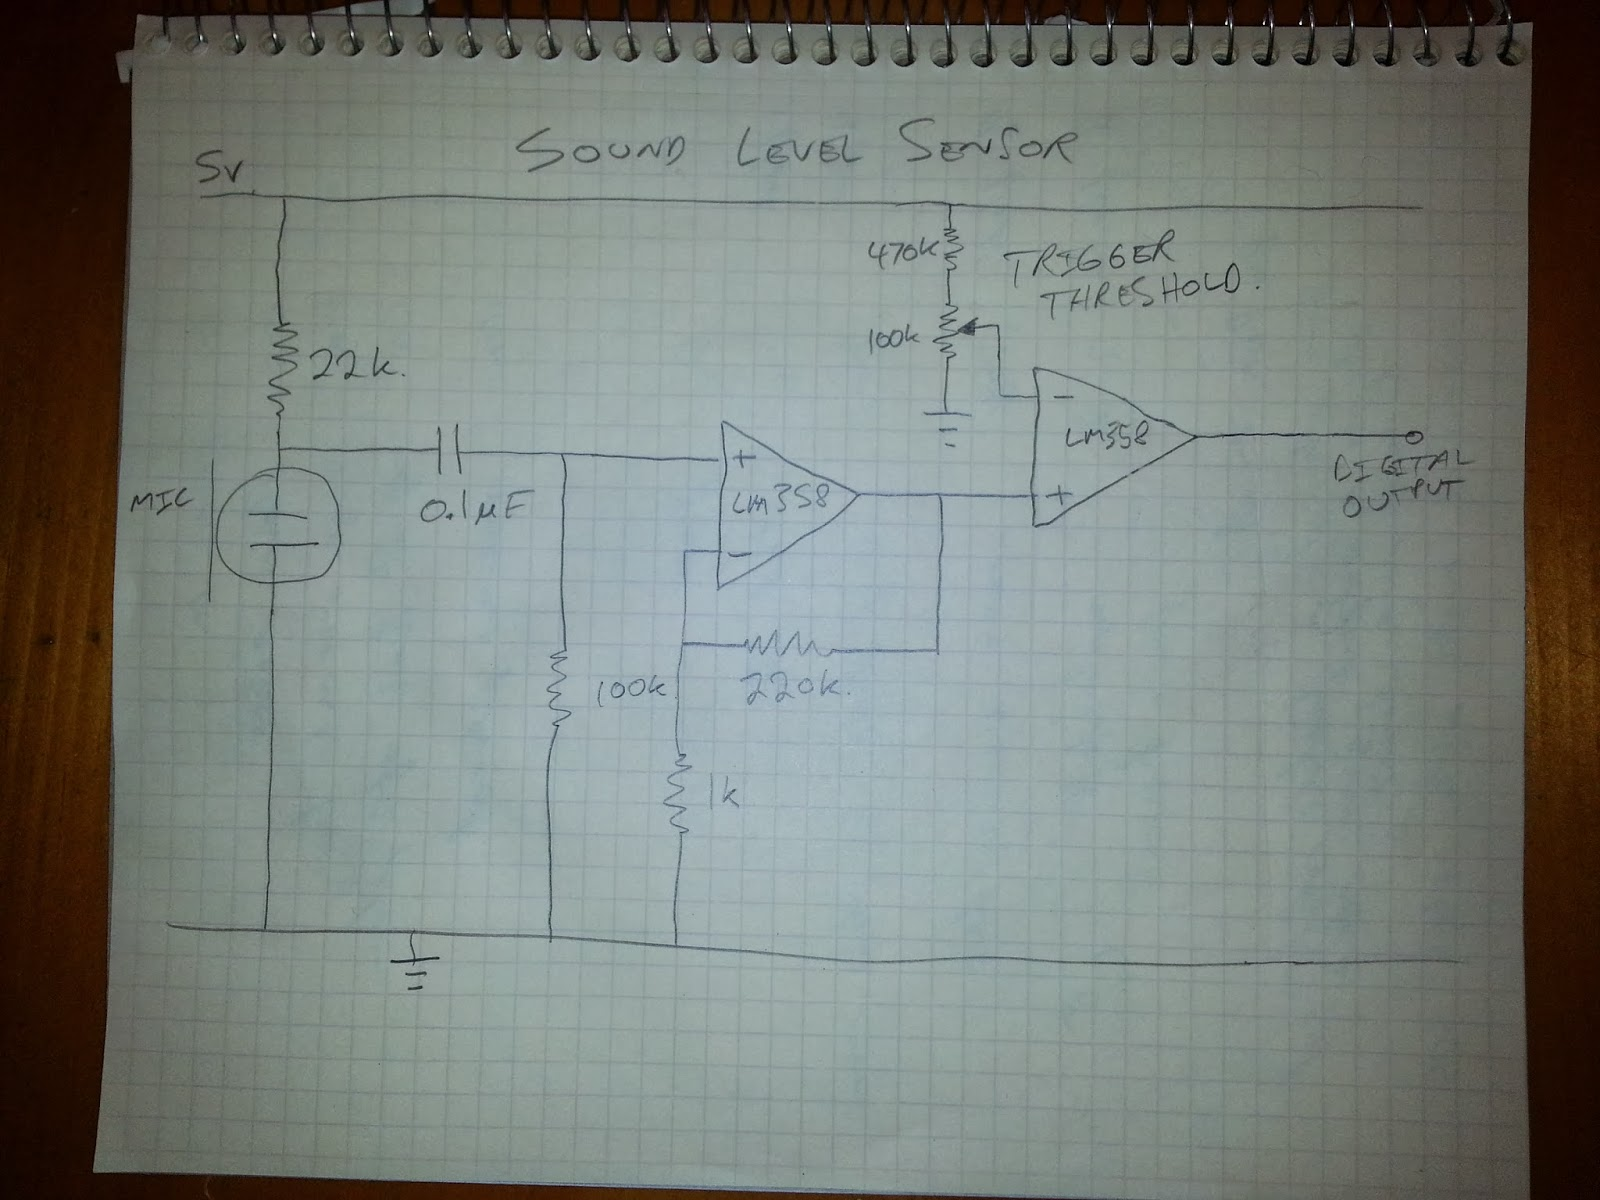 medium resolution of below is the schematic diagram of an audio input module we can below is the schematic diagram of an audio input module we can